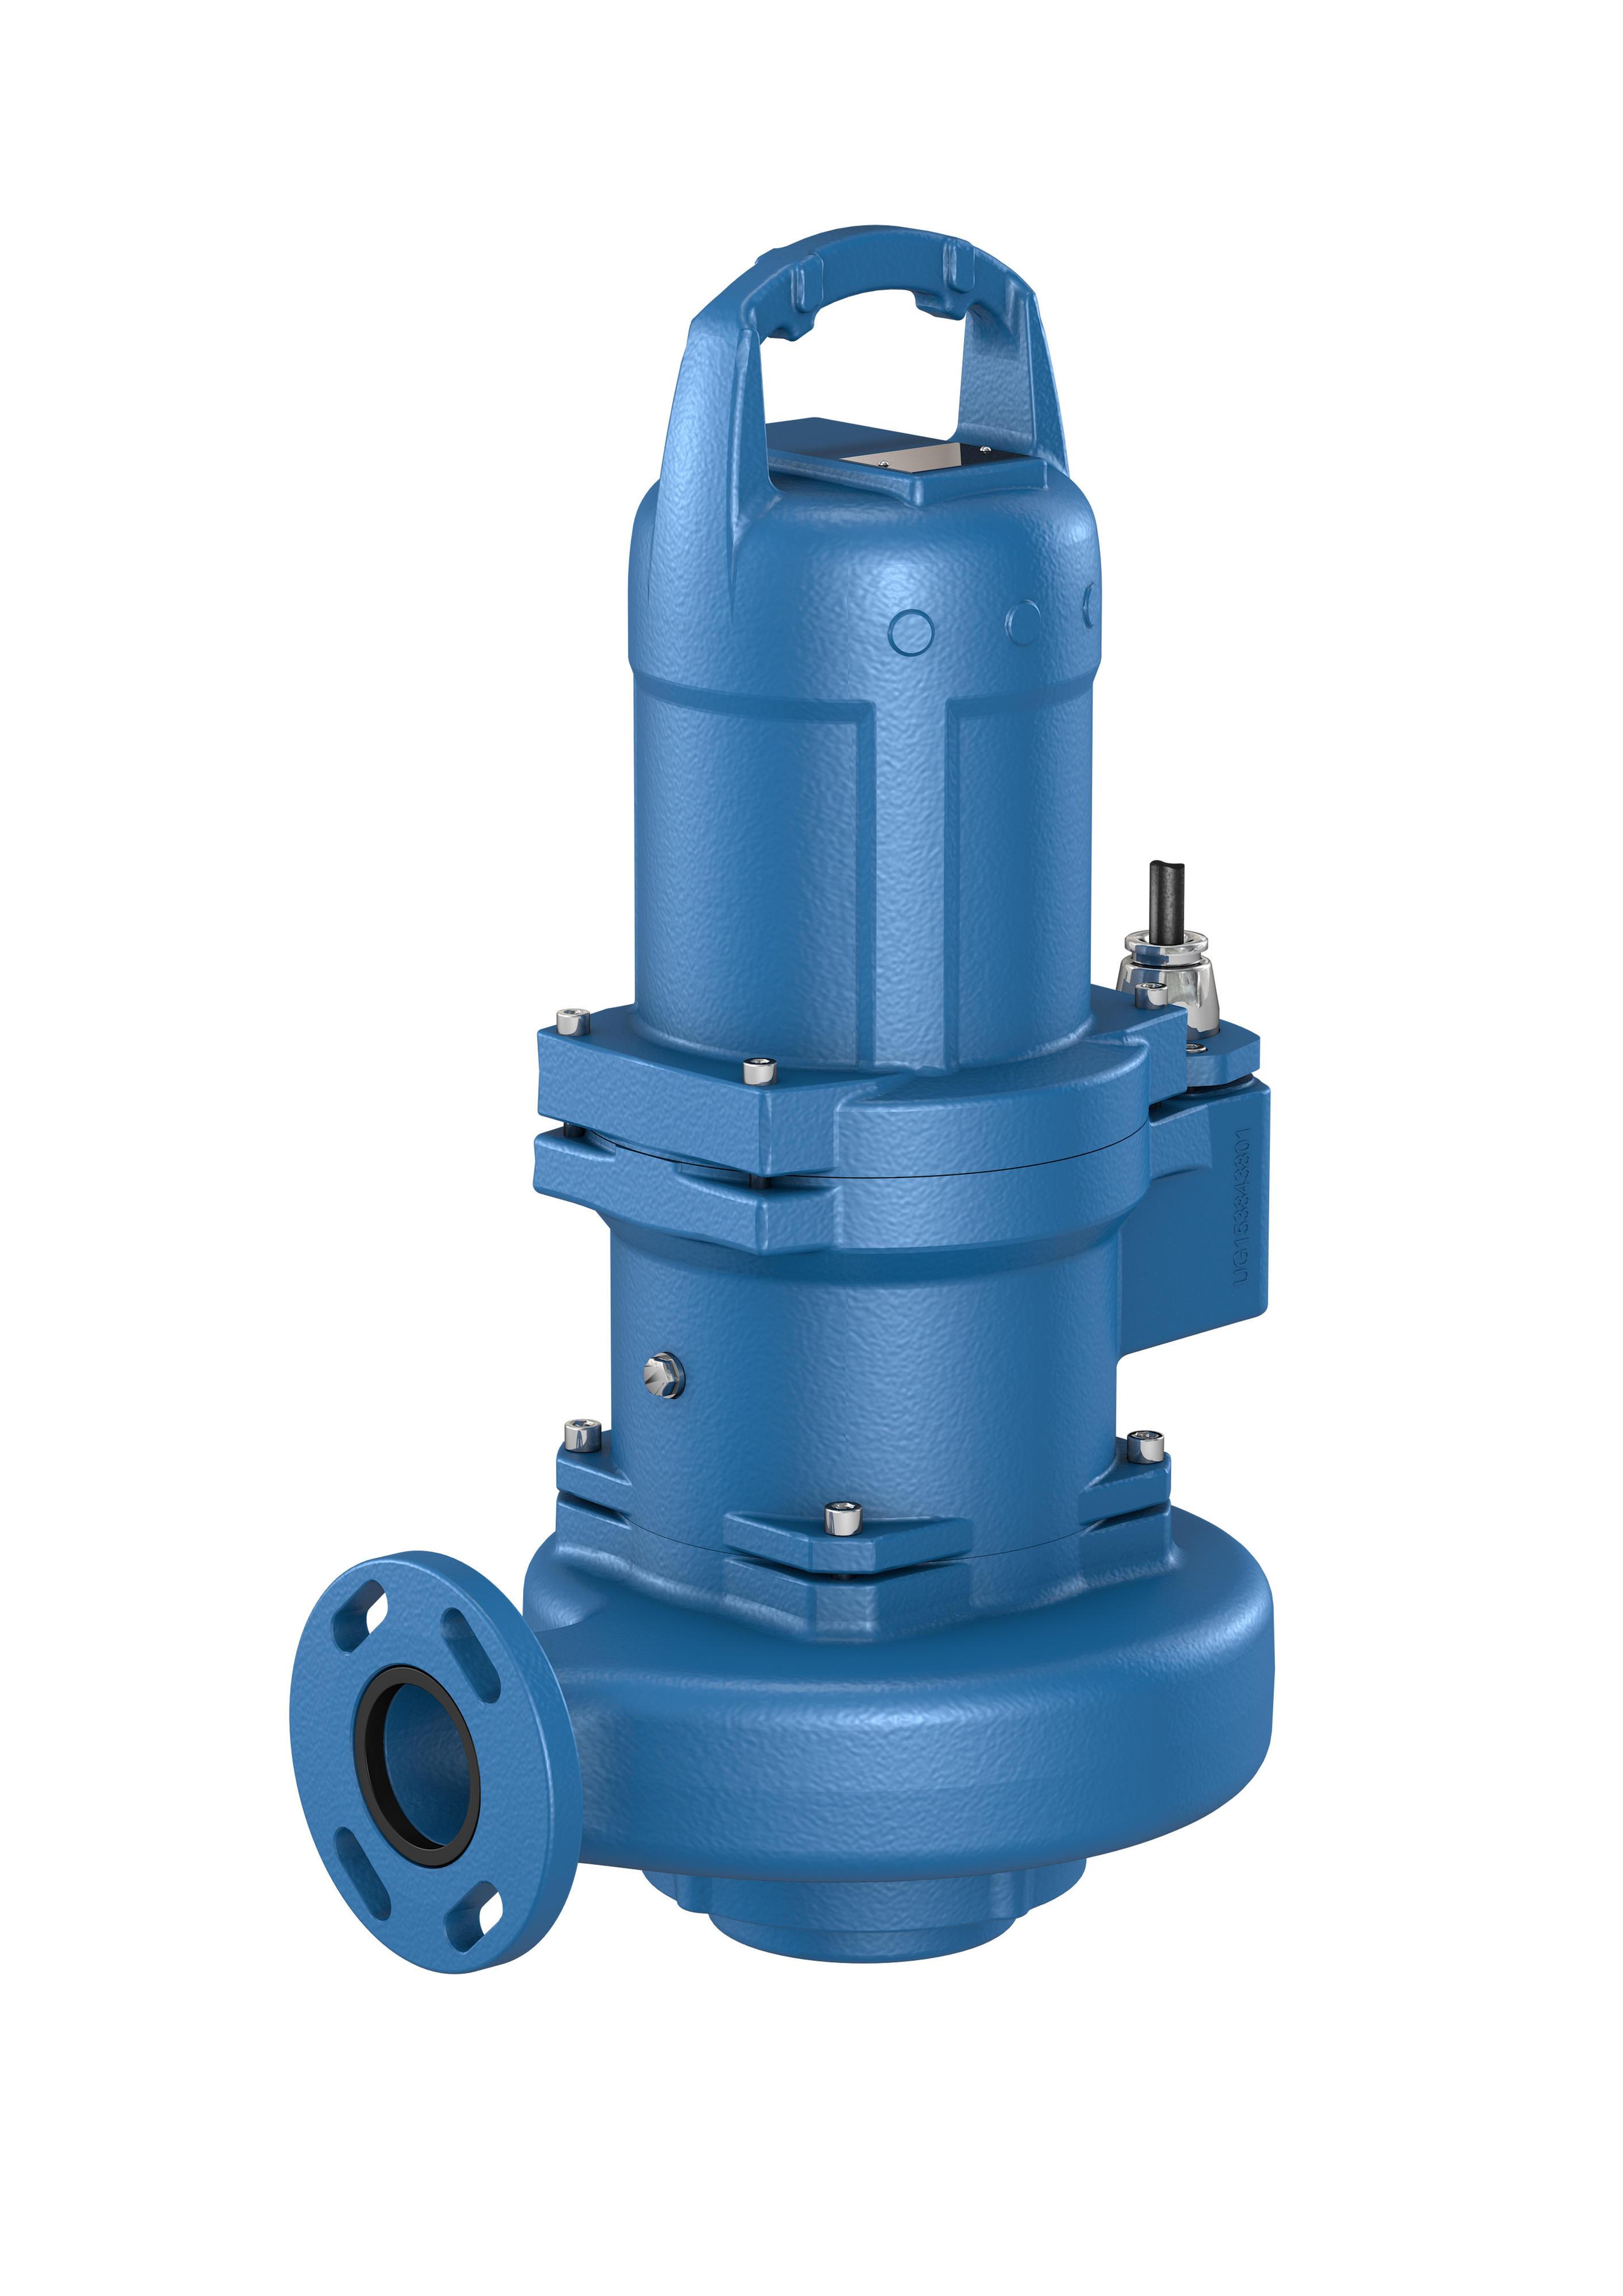 Amarex Krt Submersible Motor Pump Ksb